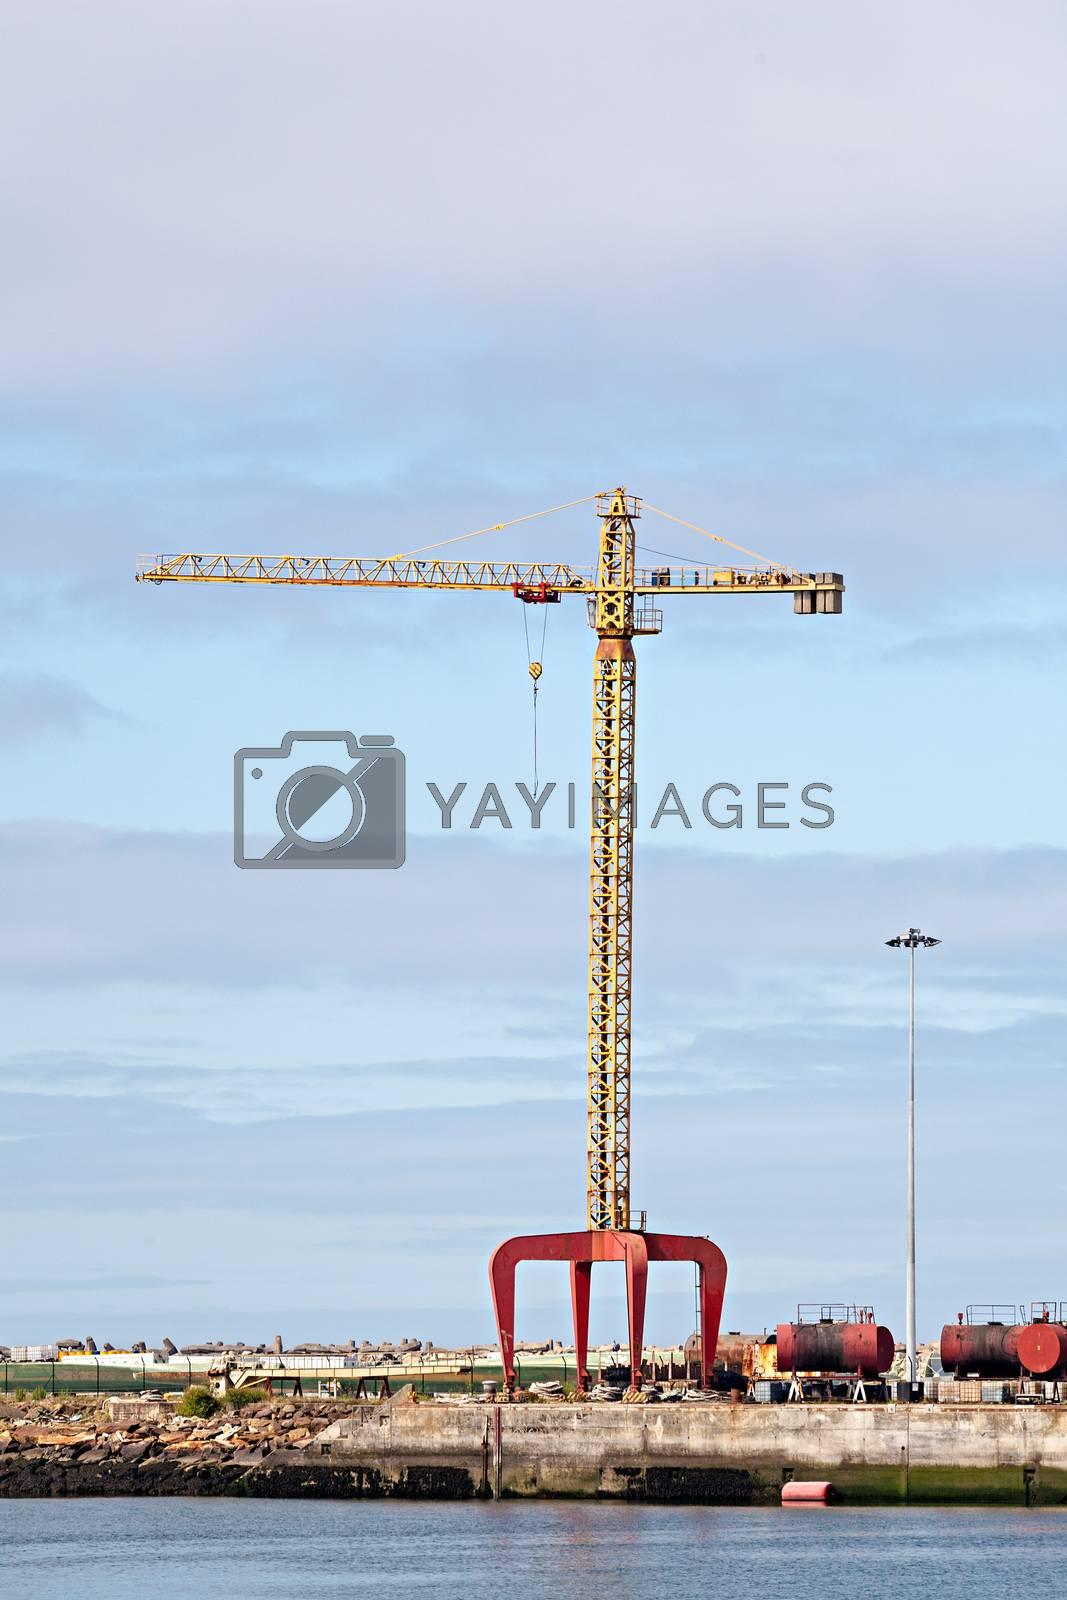 Photo of a crane at a cargo dock.